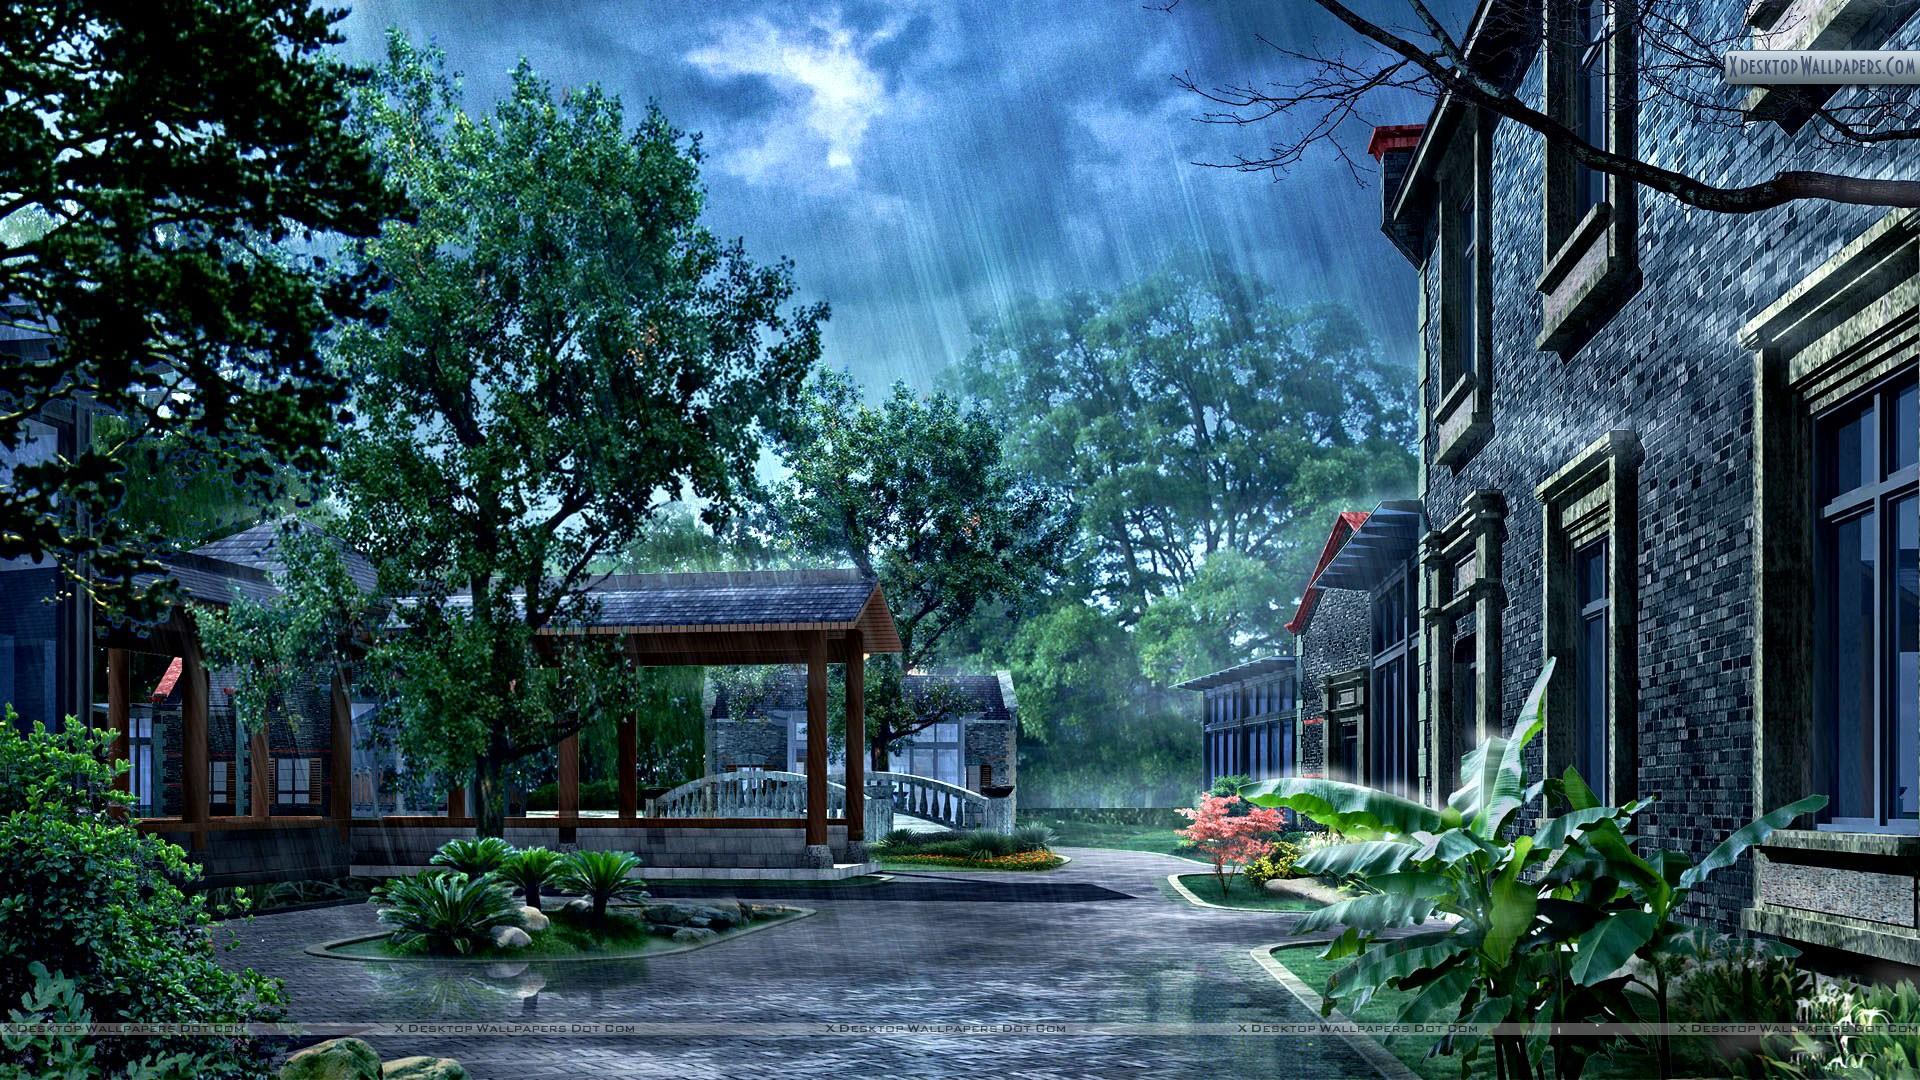 Rainy Day In Morning 1920x1080